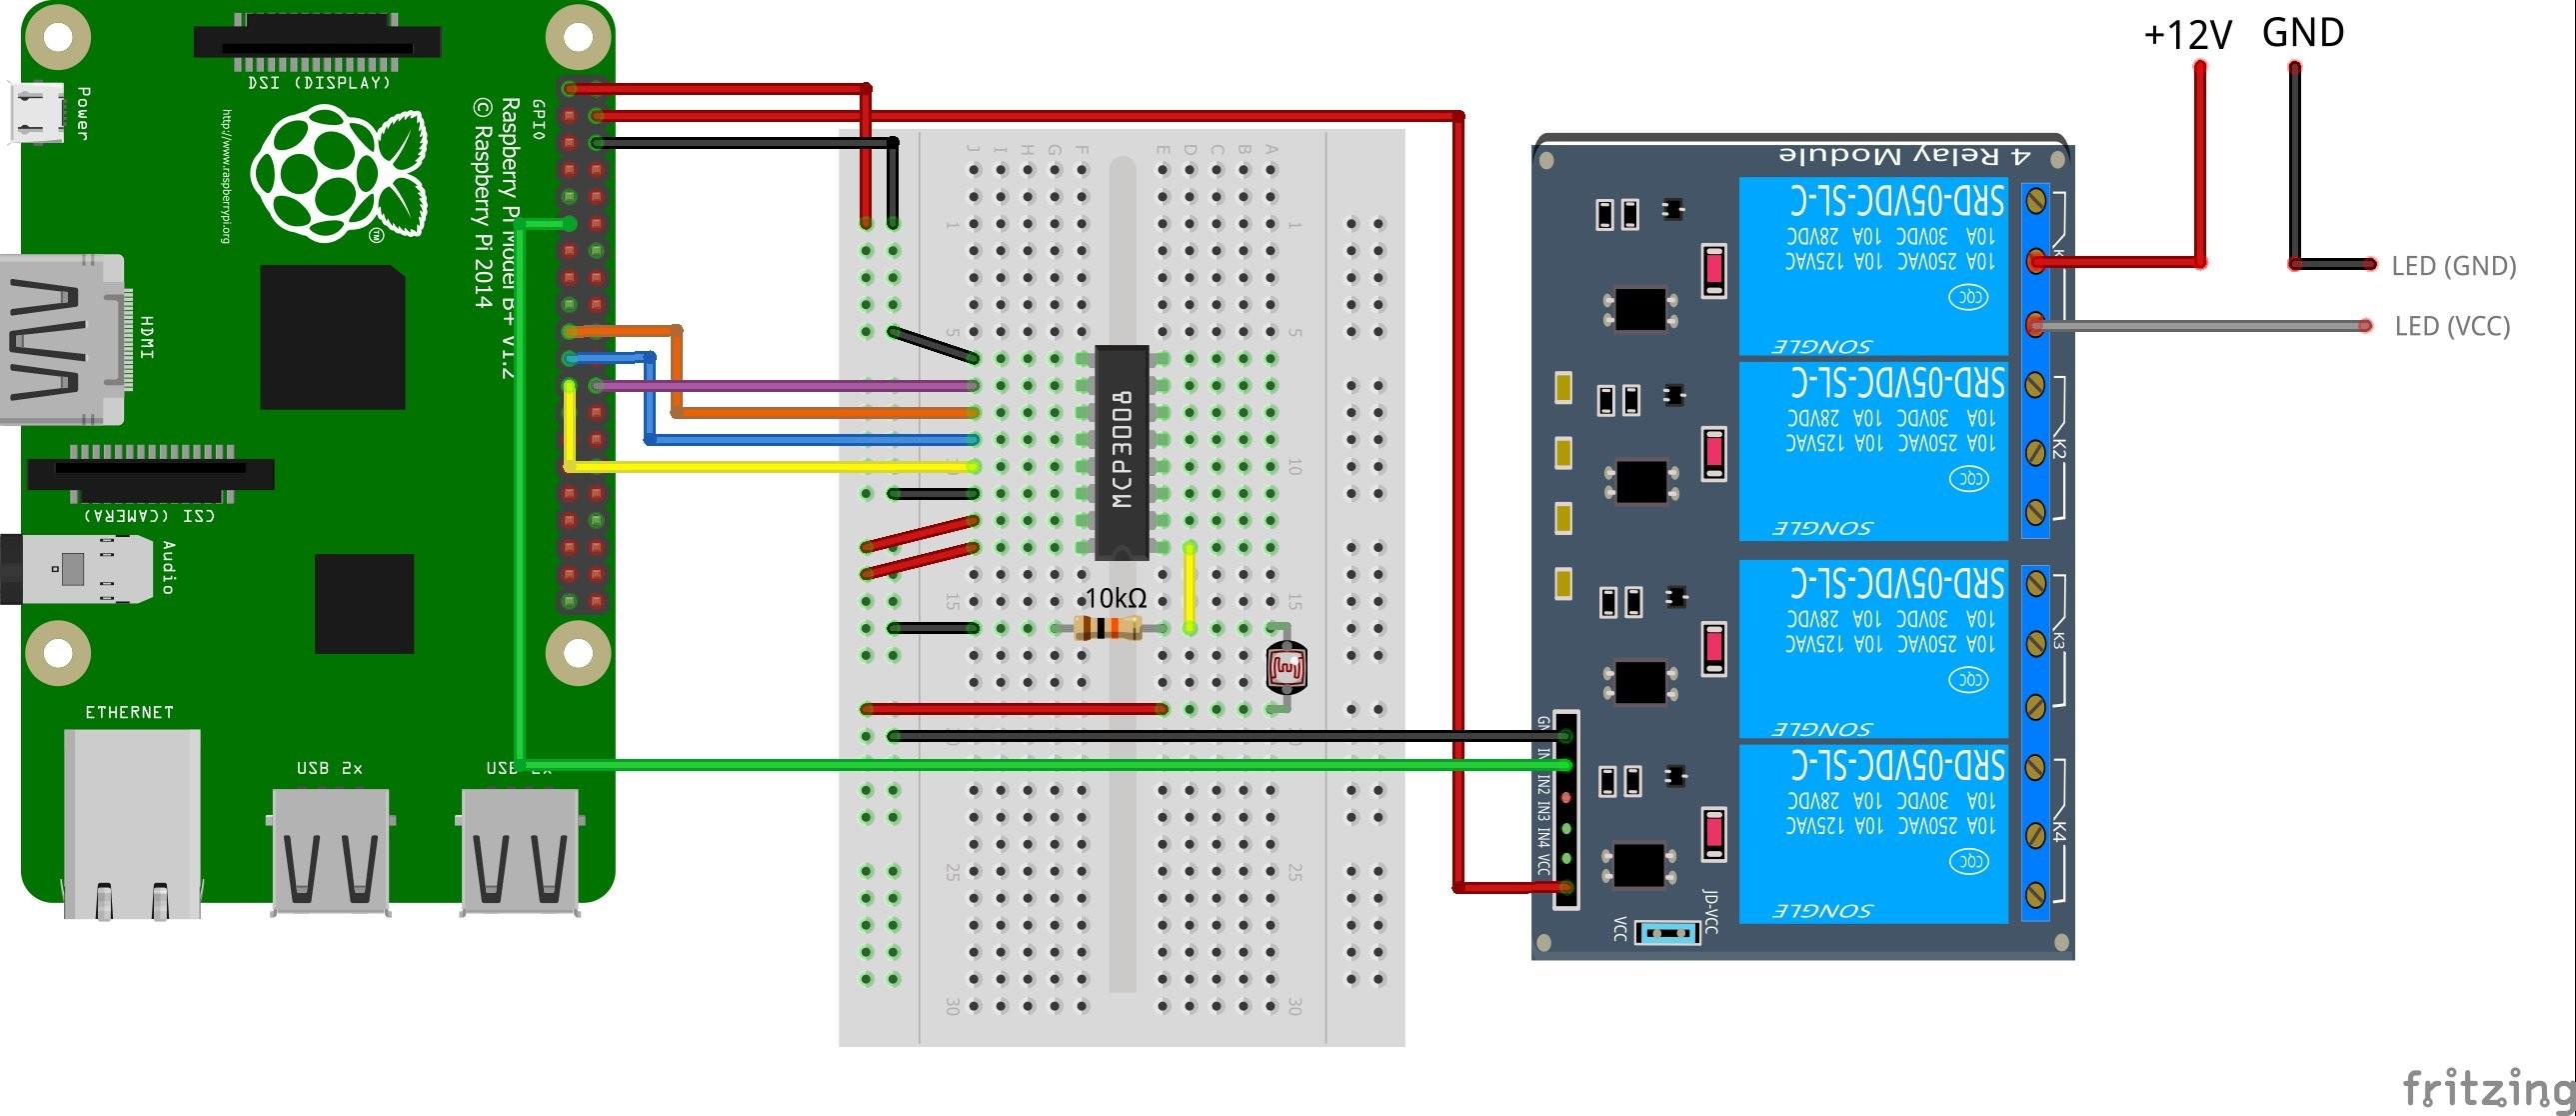 Raspberry Pi Circuit Diagram Beautiful Build Your Own Automatic Raspberry Pi Greenhouse Raspberry Pi Circuit